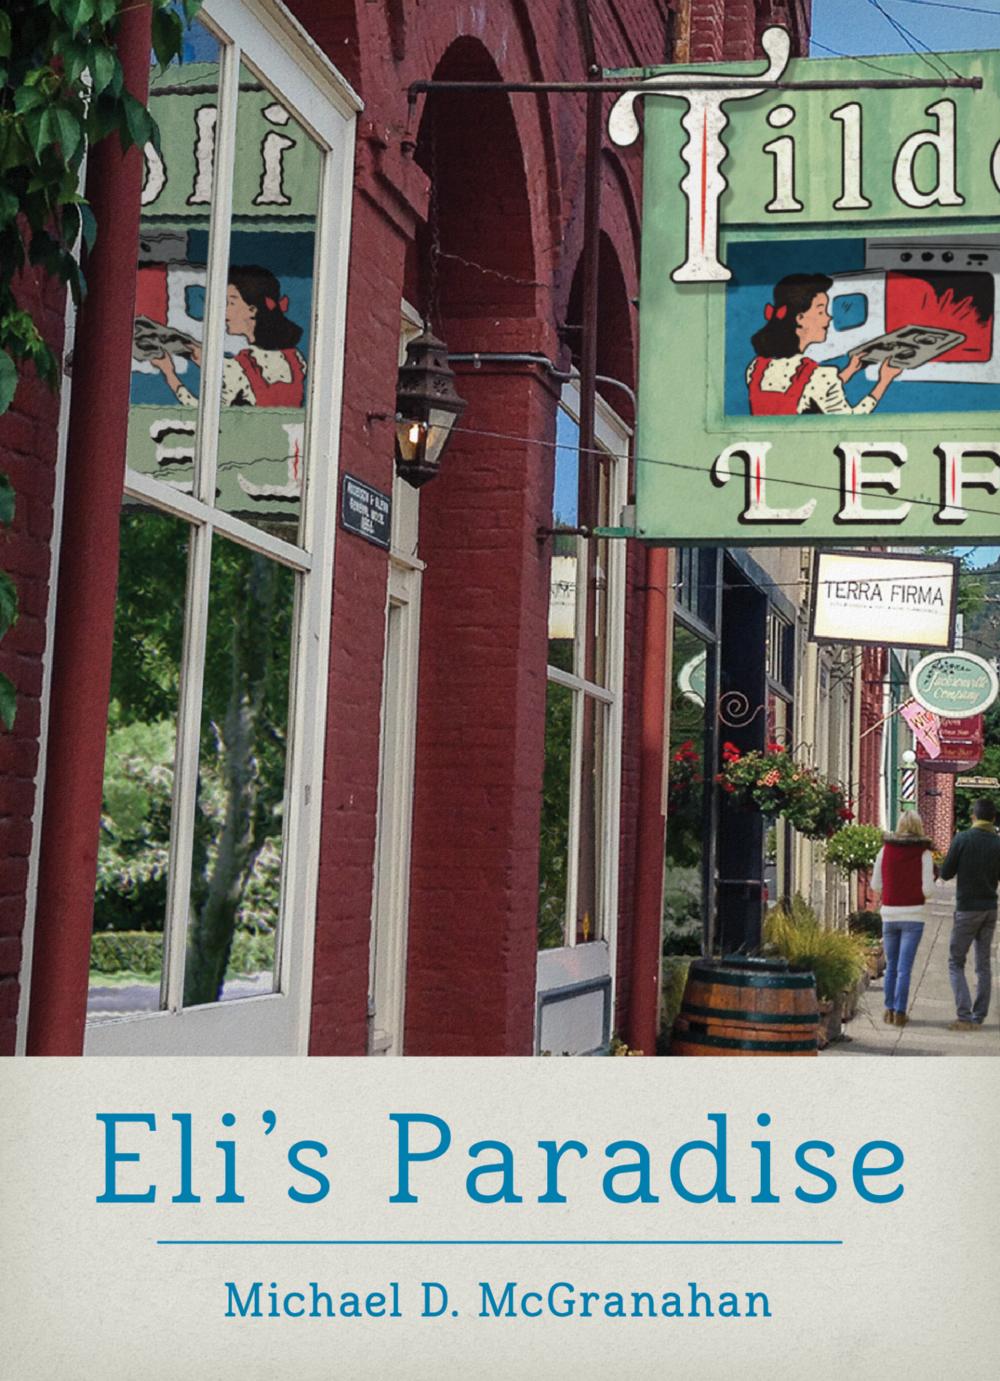 Eli's_Paradise-Cover_FINAL.jpg